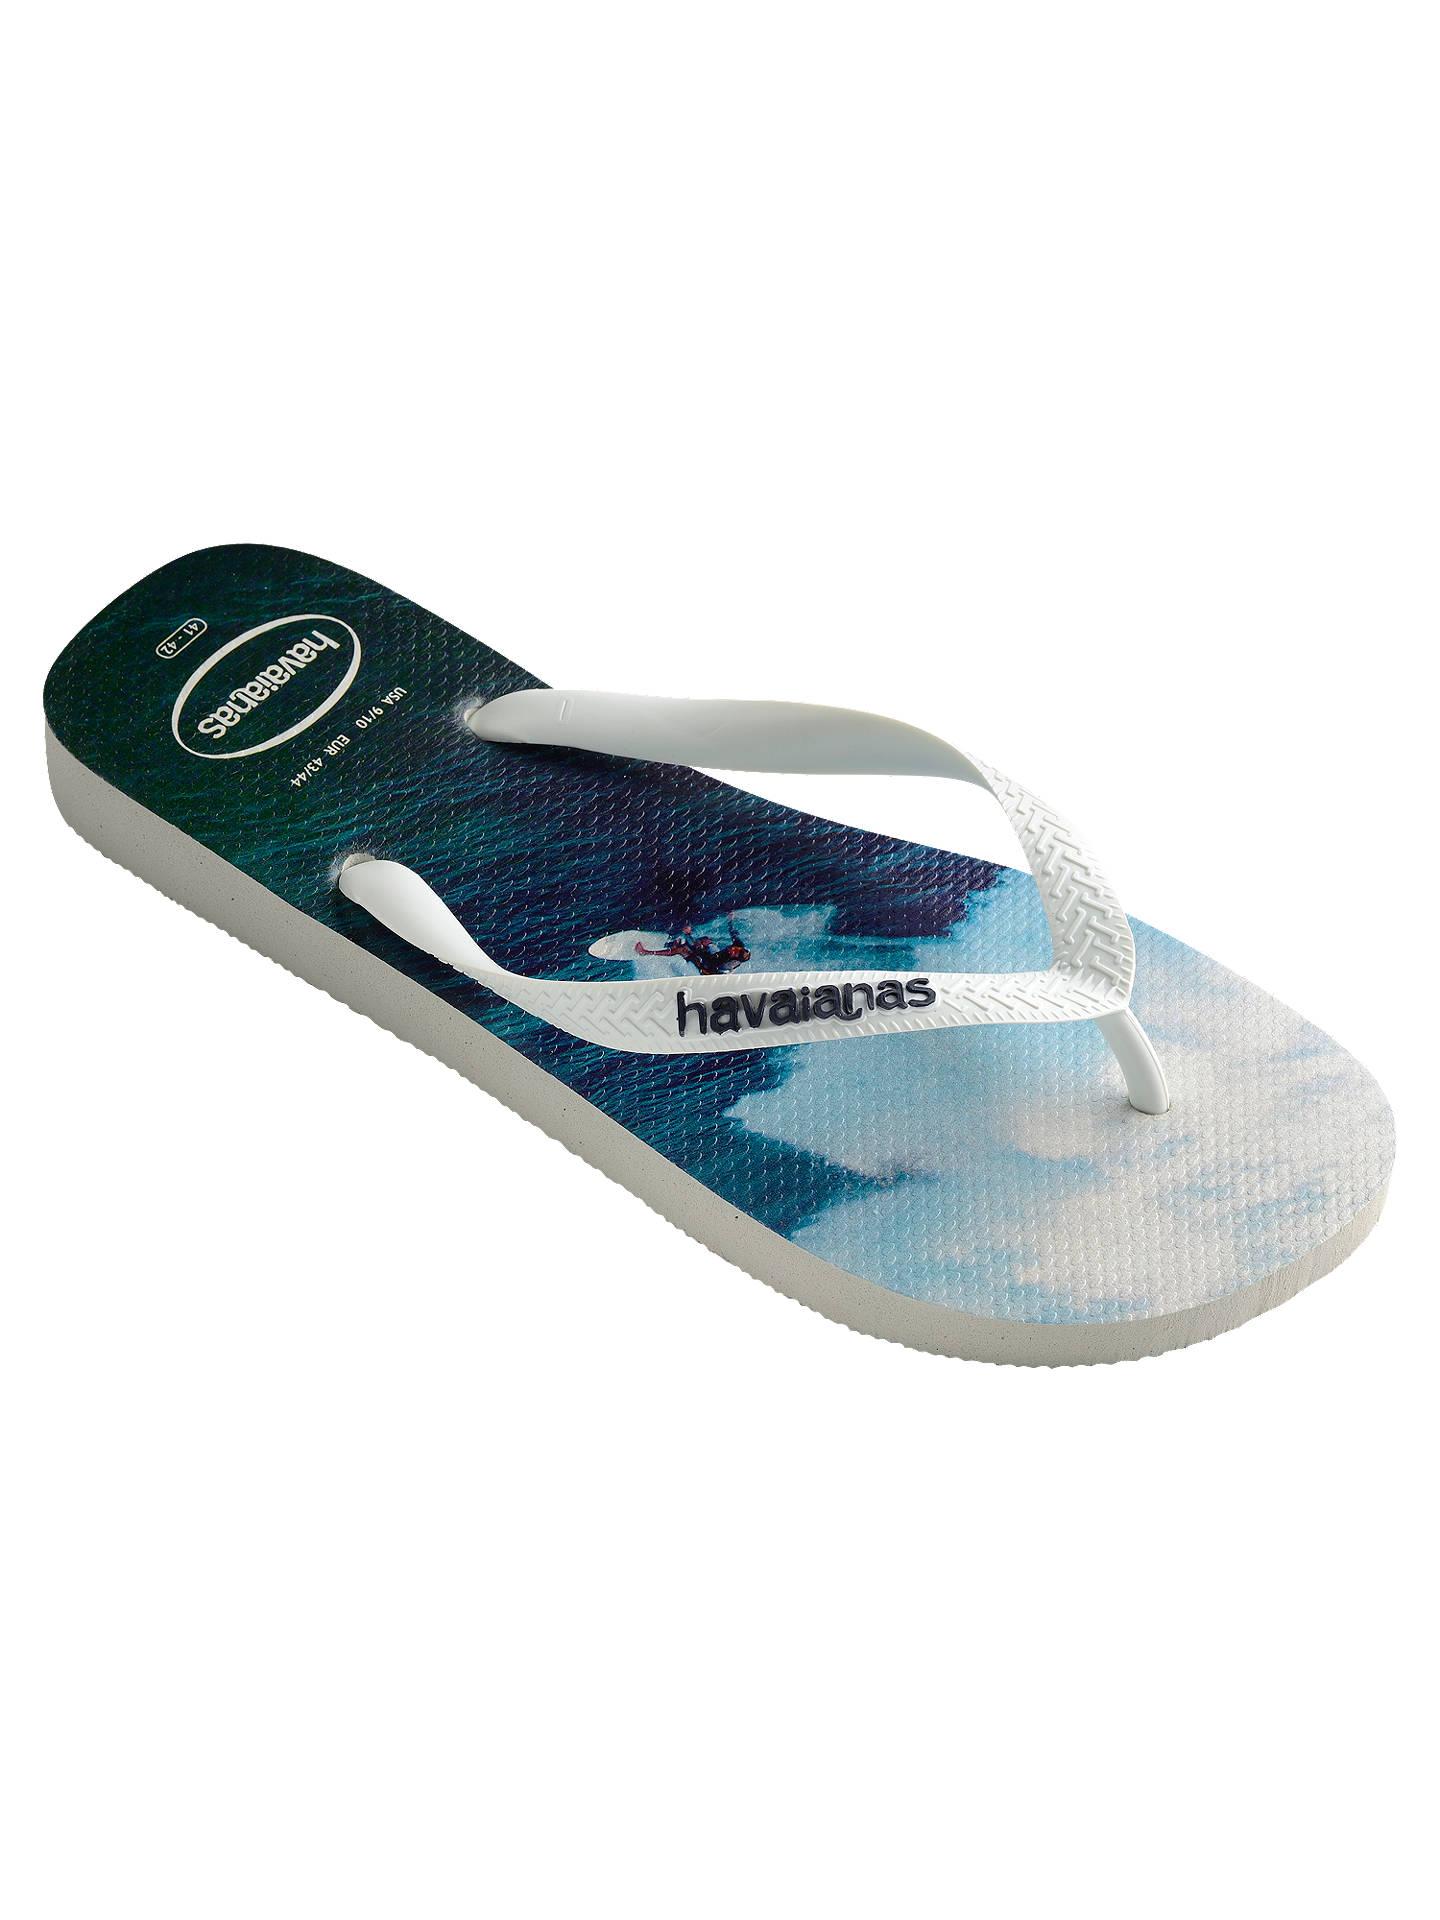 8a33b8b0499efb Buy Havaianas Surfer Print Flip Flops